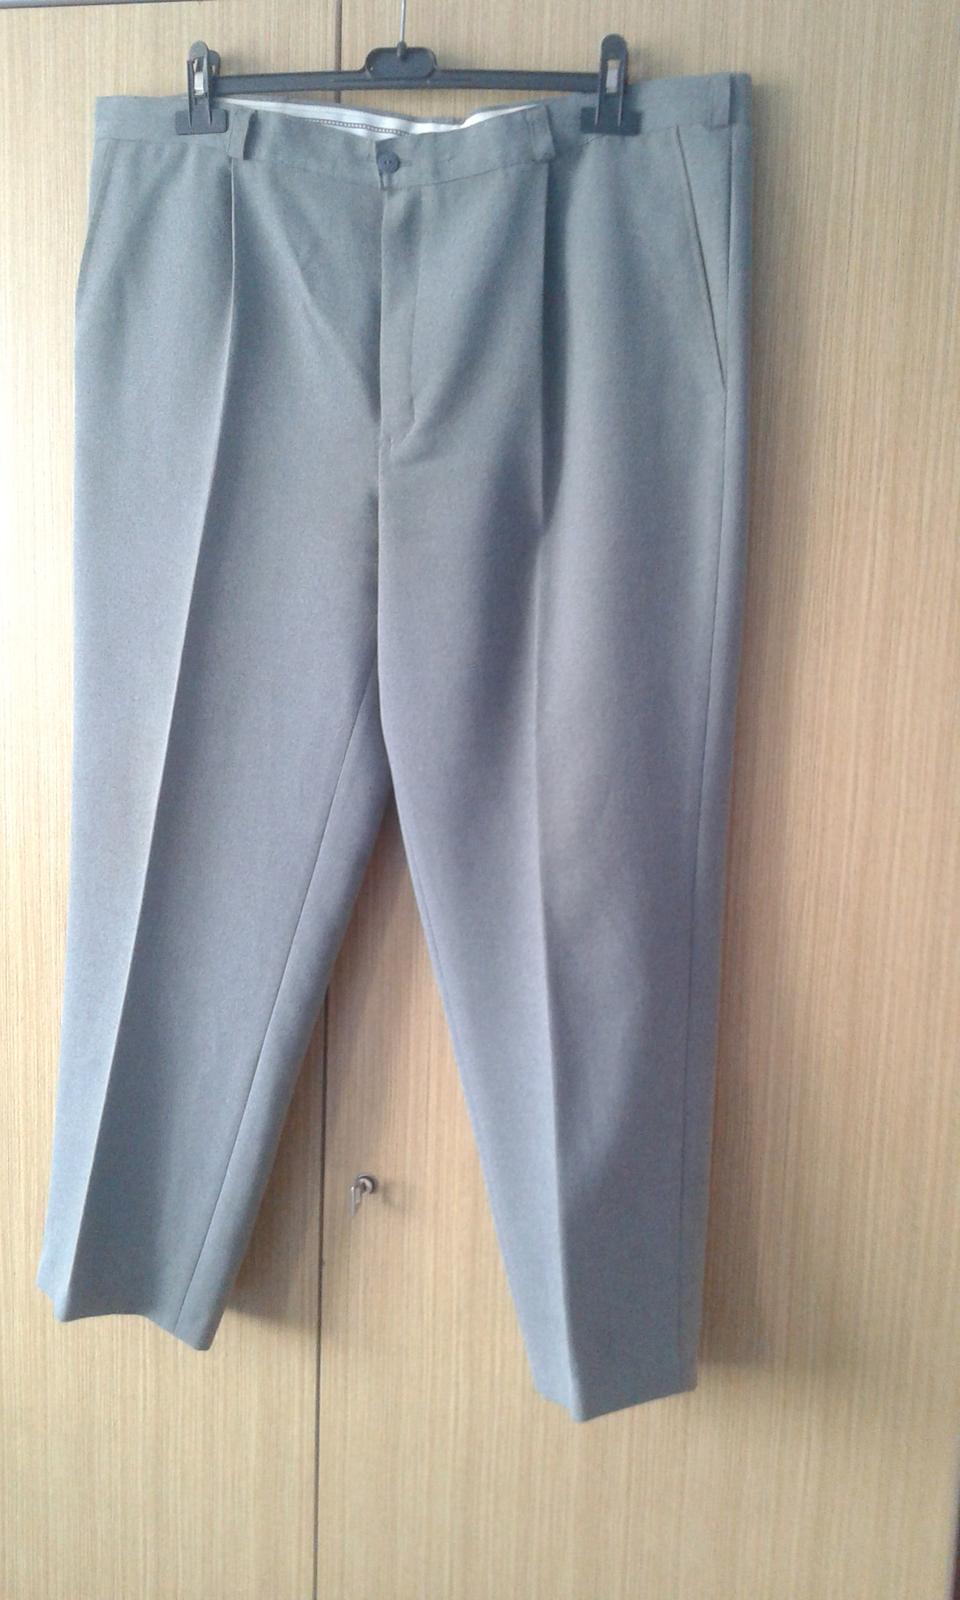 Pánske šedé oblekové nohavice - Obrázok č. 1